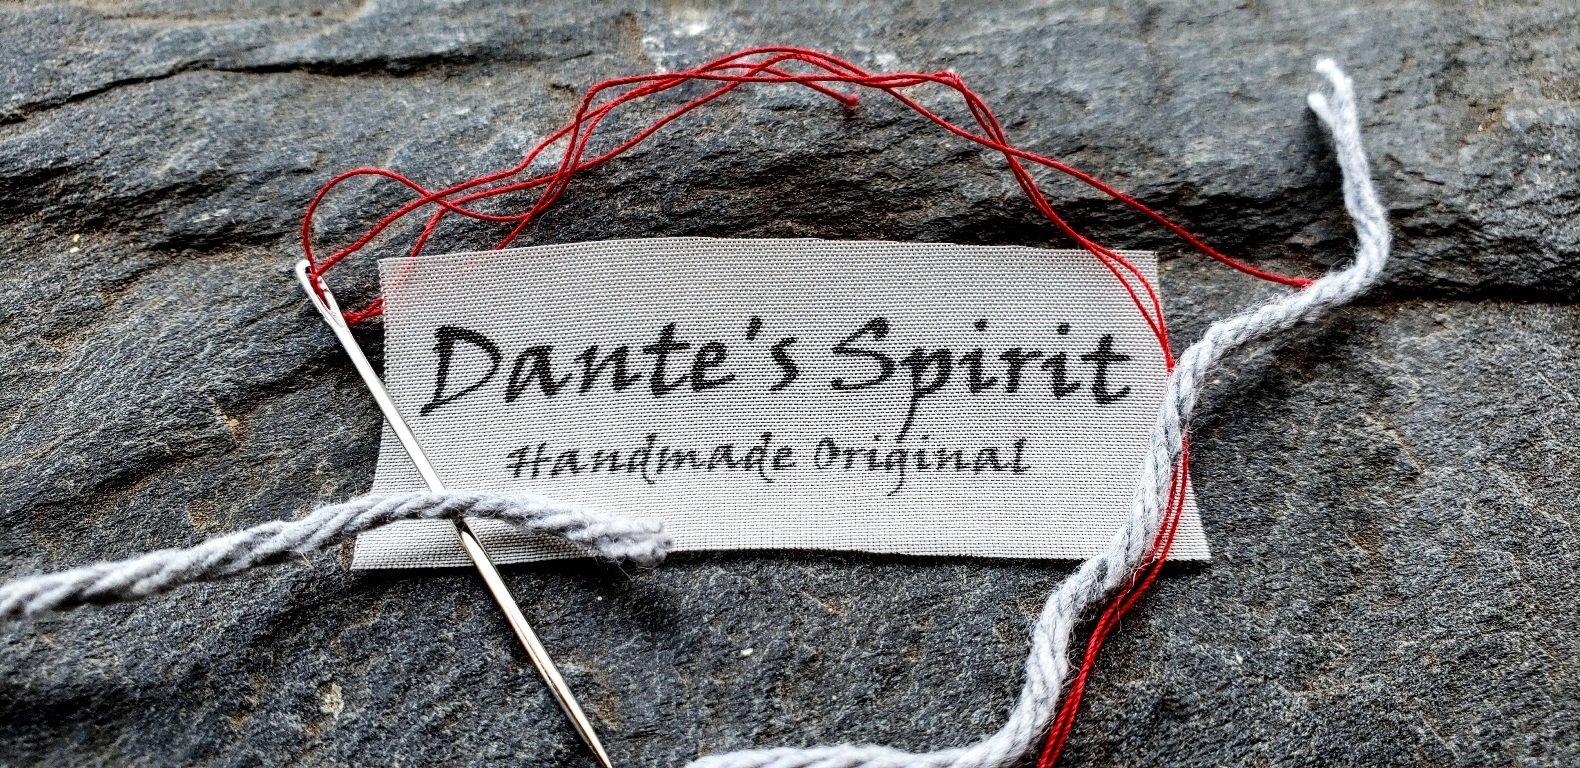 Dante's Spirit